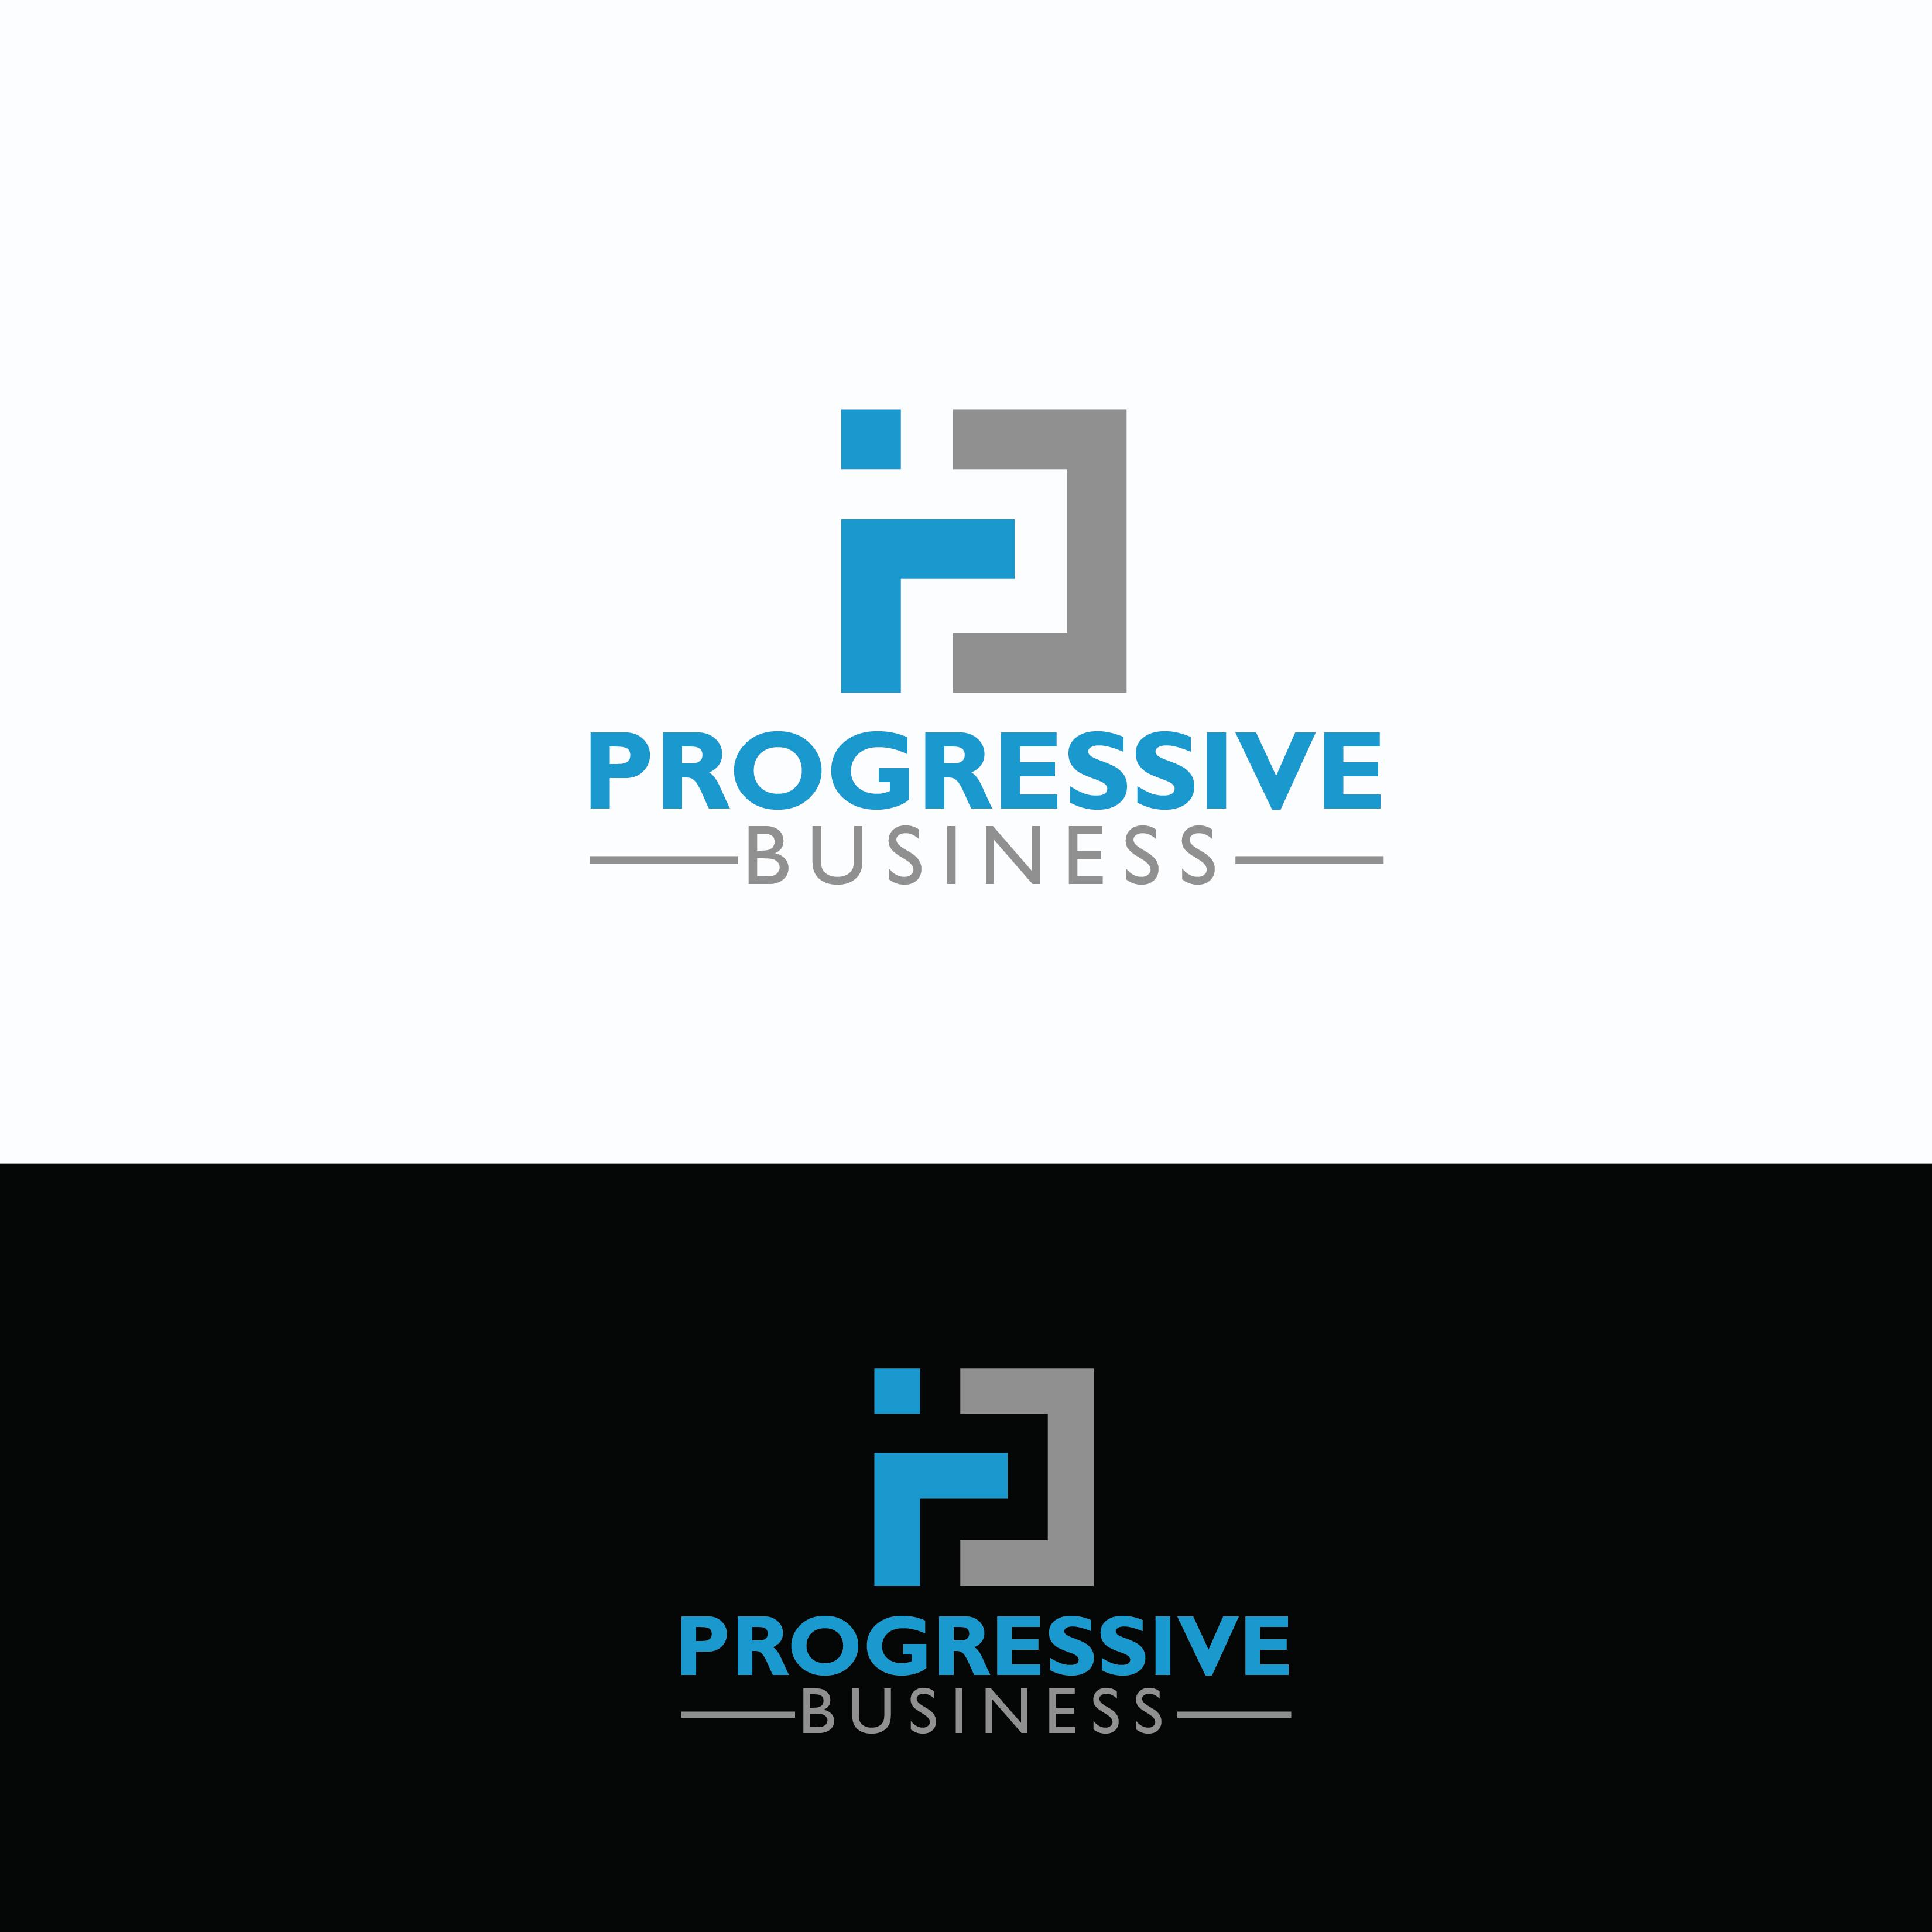 Logo Design by Private User - Entry No. 121 in the Logo Design Contest Captivating Logo Design for Progressive Business.